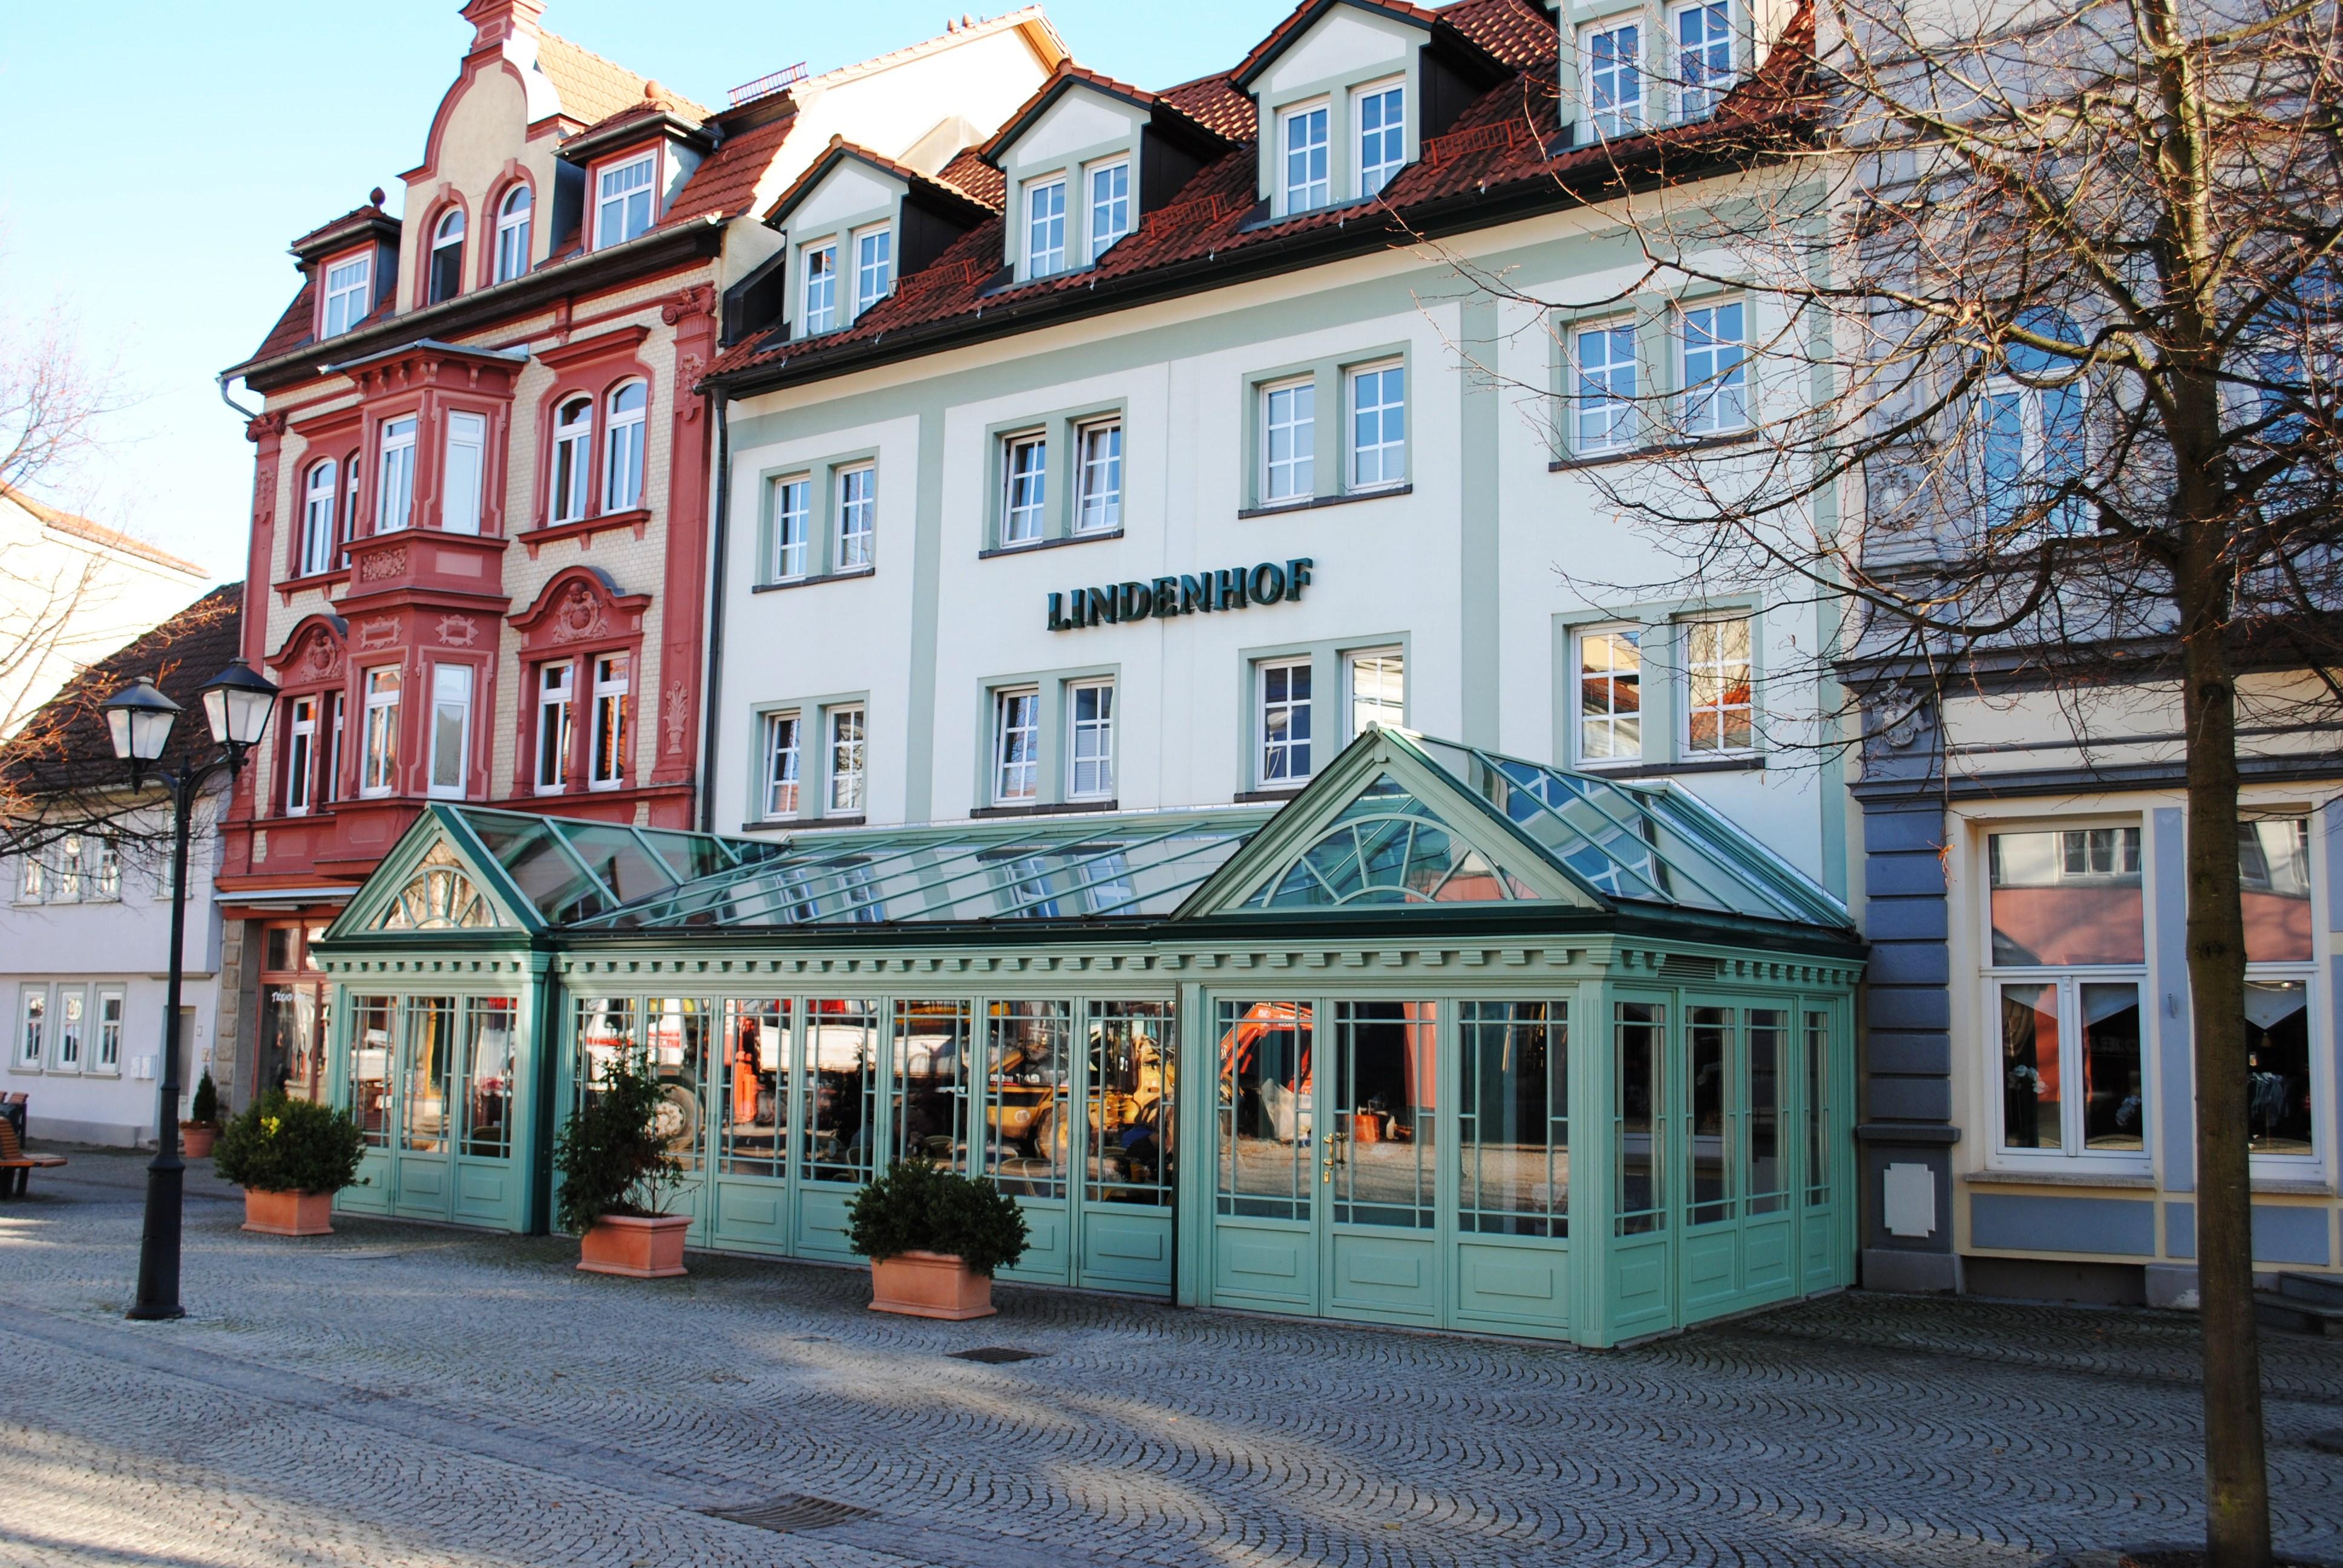 File:Ilmenau, Hotel Lindenhof, Lindenstraße 11.jpg - Wikimedia Commons